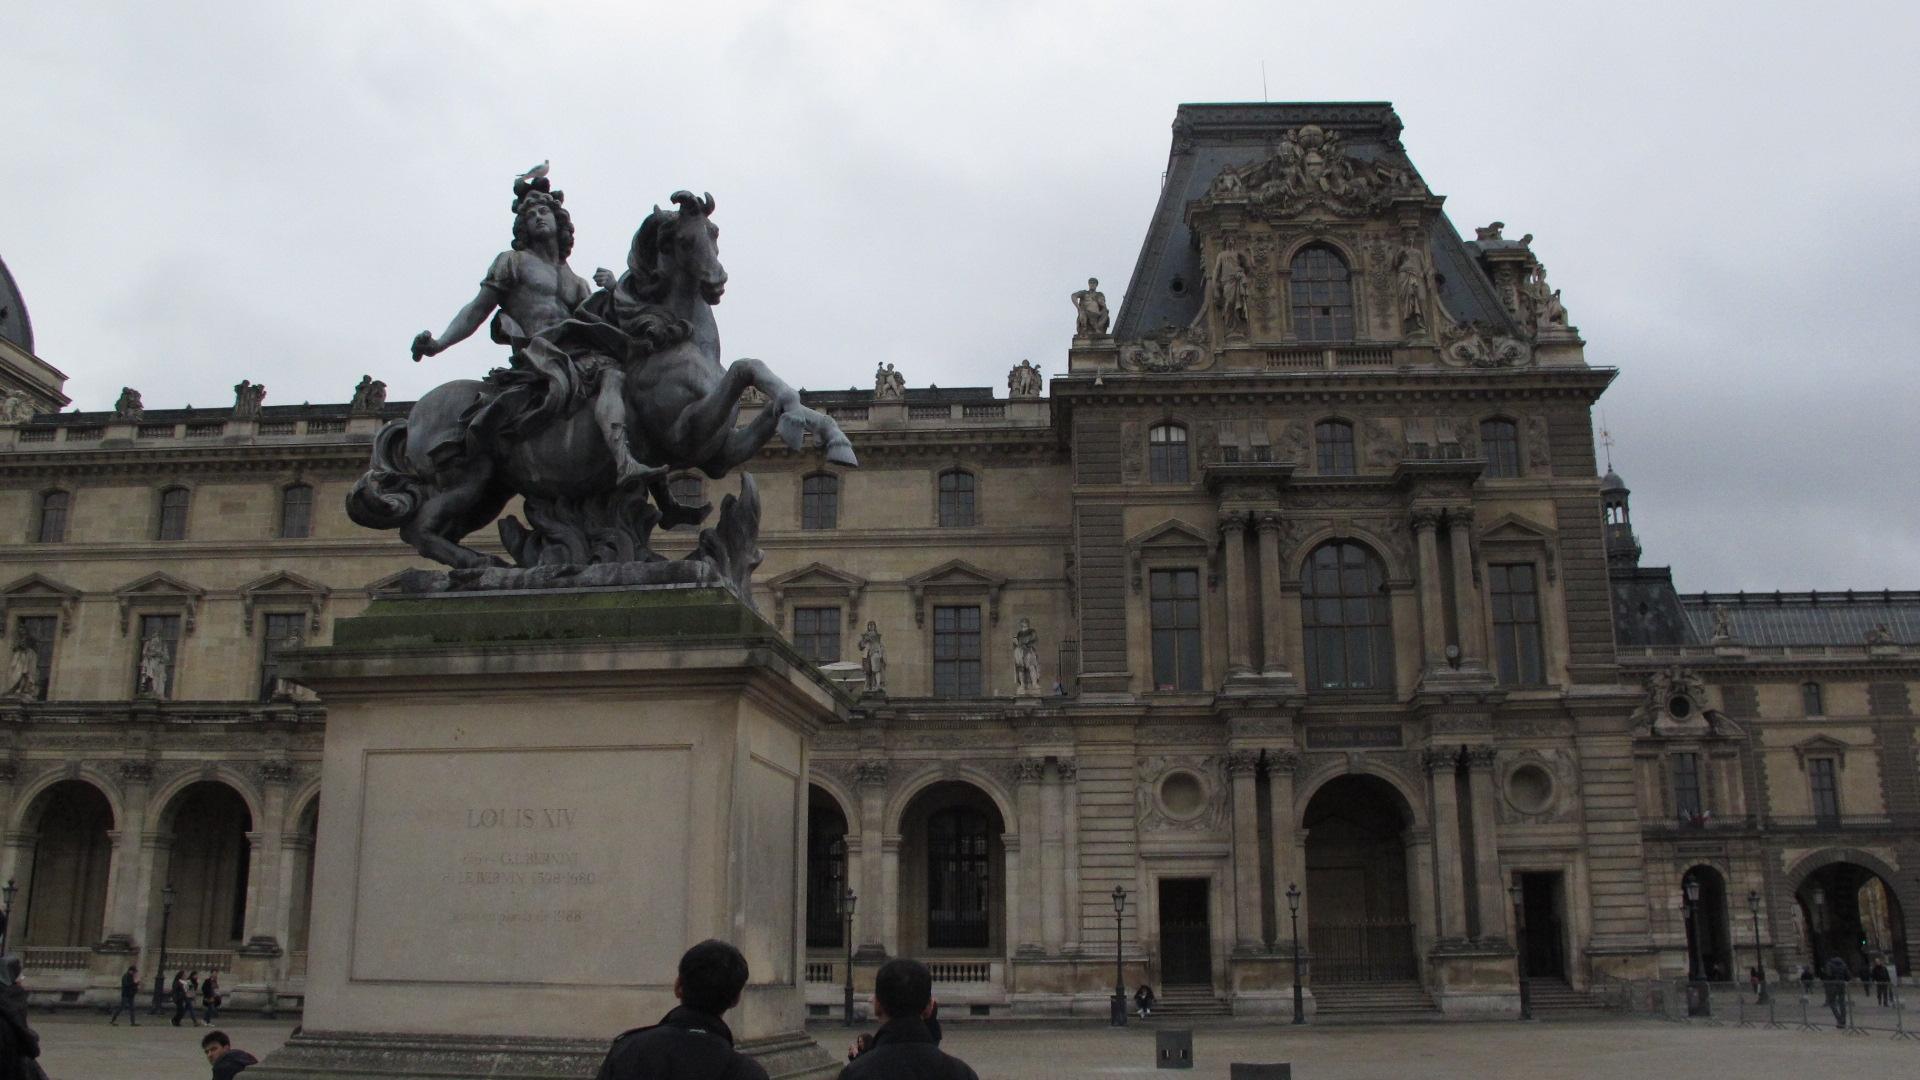 Pada 1682, Louis XIV, si Raja Matahari, memilih Istana Versailles sebagai kediaman pribadi, meninggalkan Louvre untuk dijadikan tempat menampilkan koleksi-koleksi kerajaan.